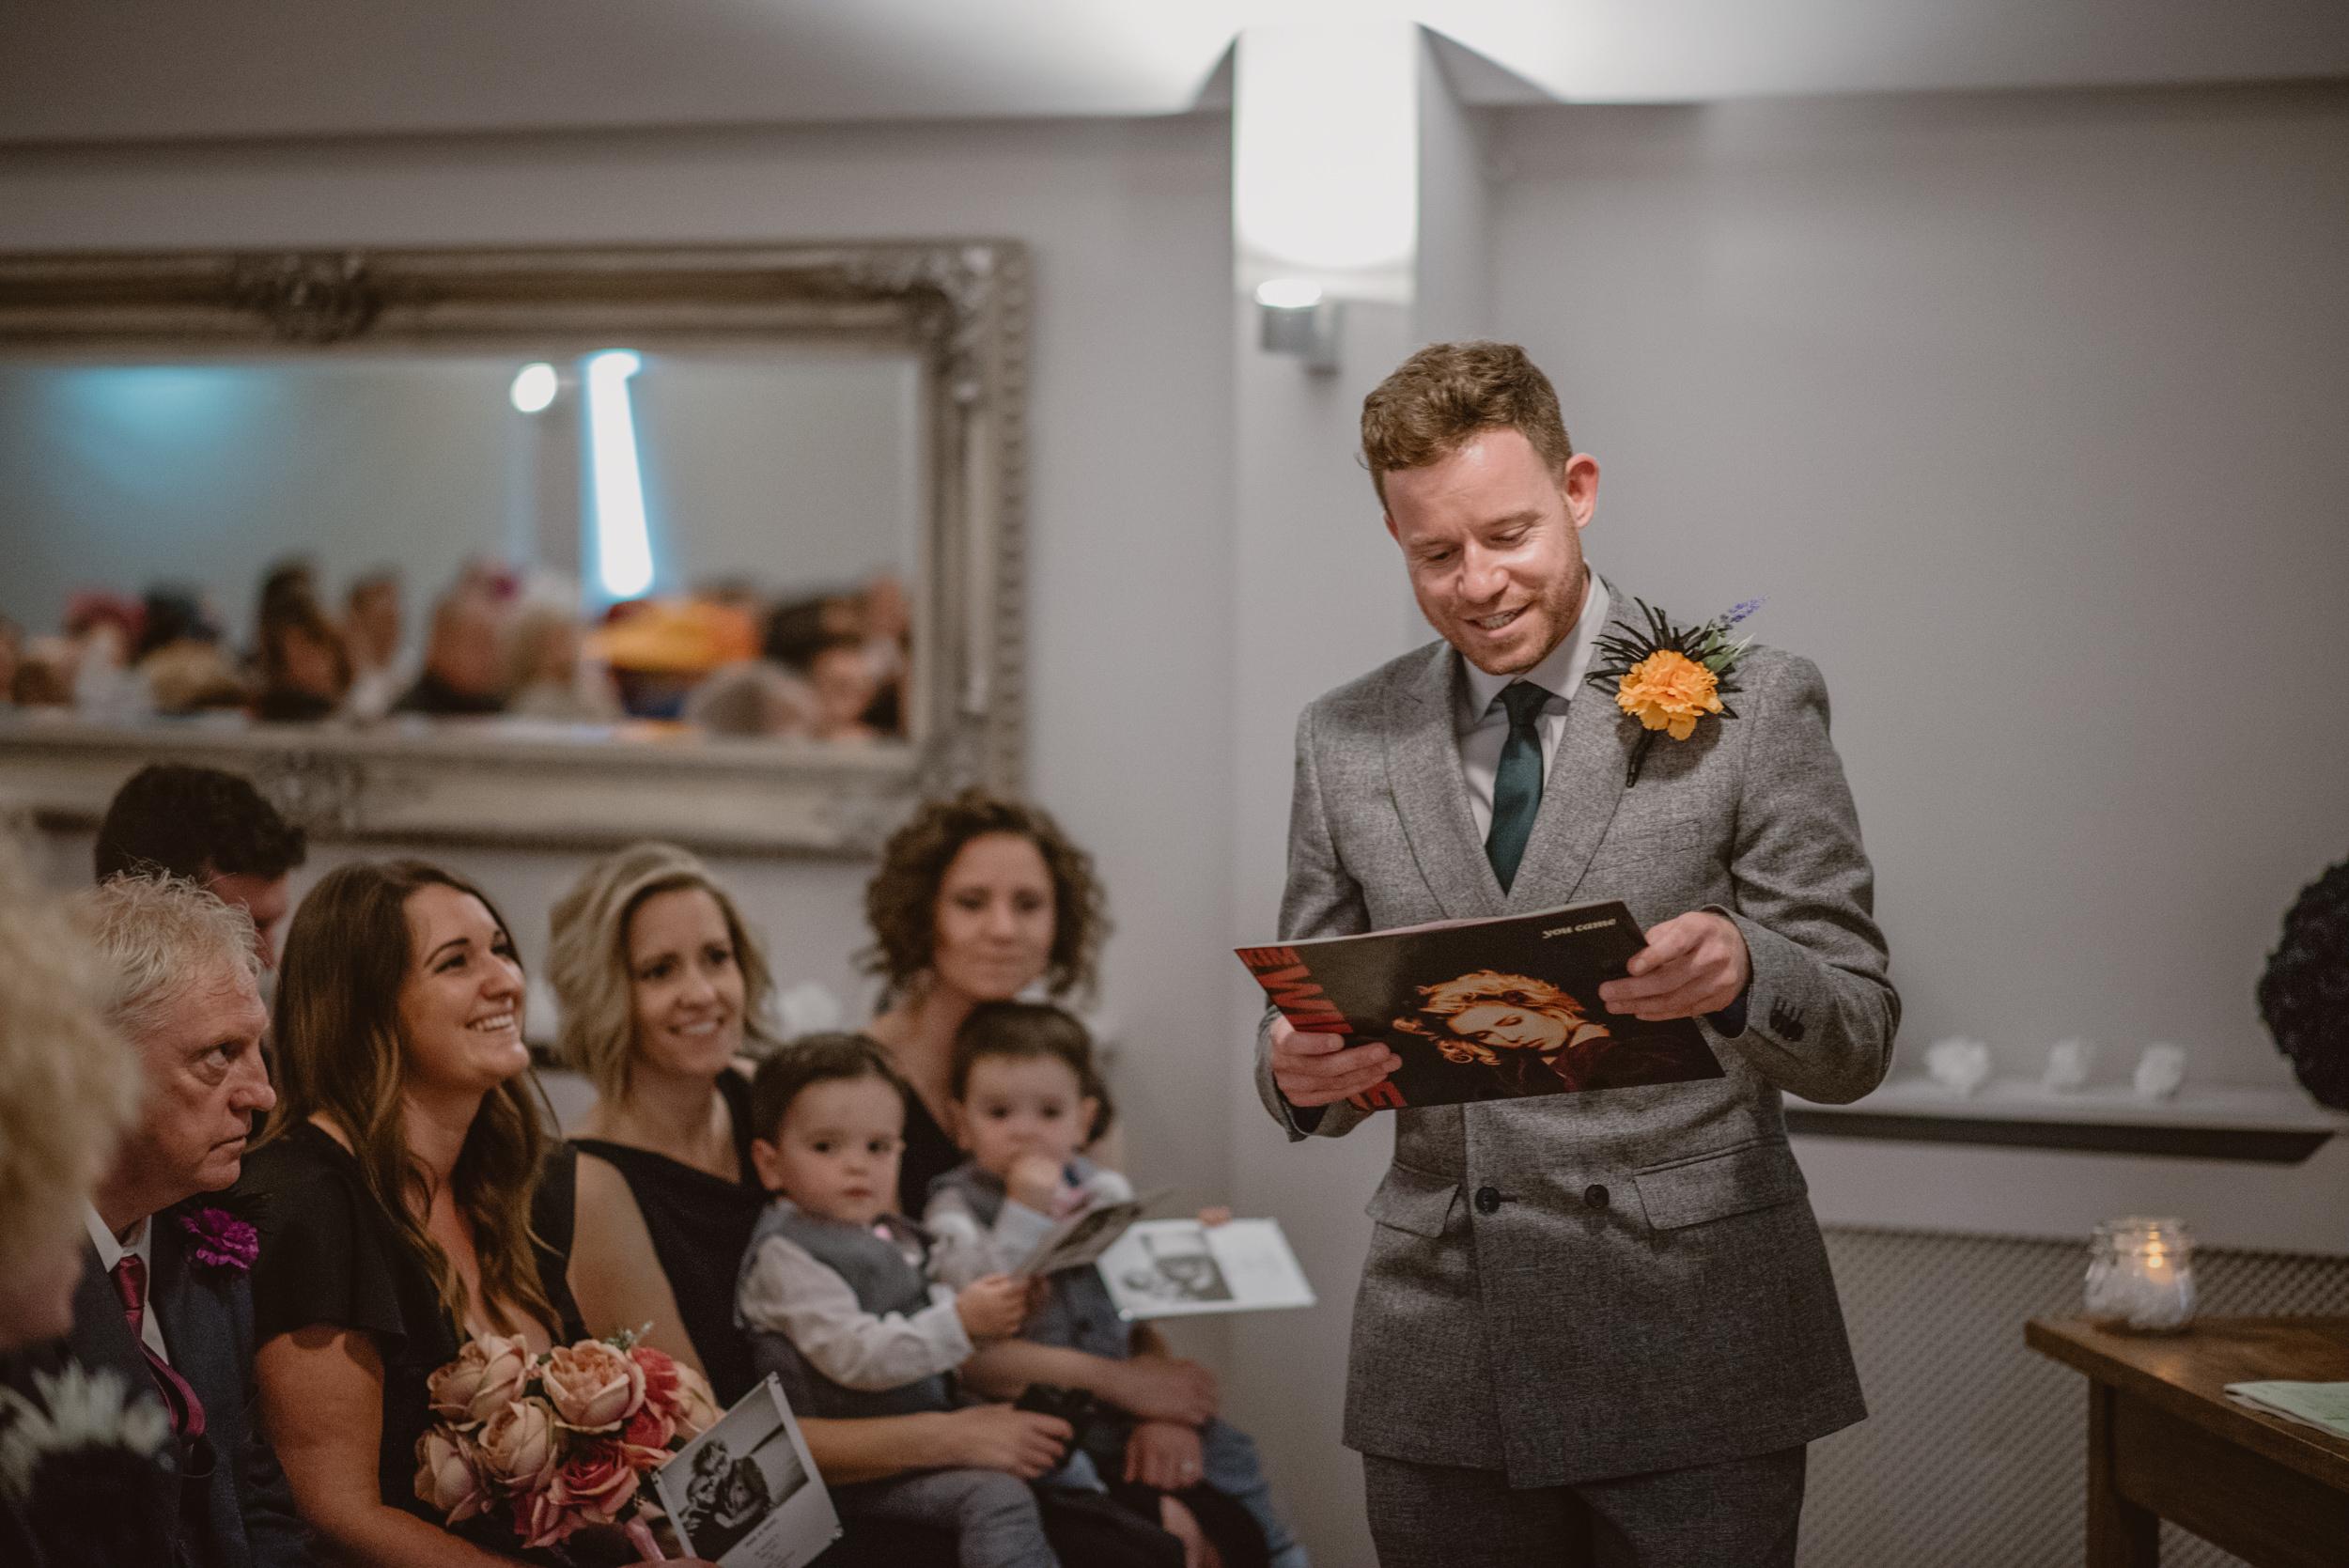 Barry-and-Chaz-wedding-Wasing-Park-Berkshire-Manu-Mendoza-Wedding-Photography-178.jpg